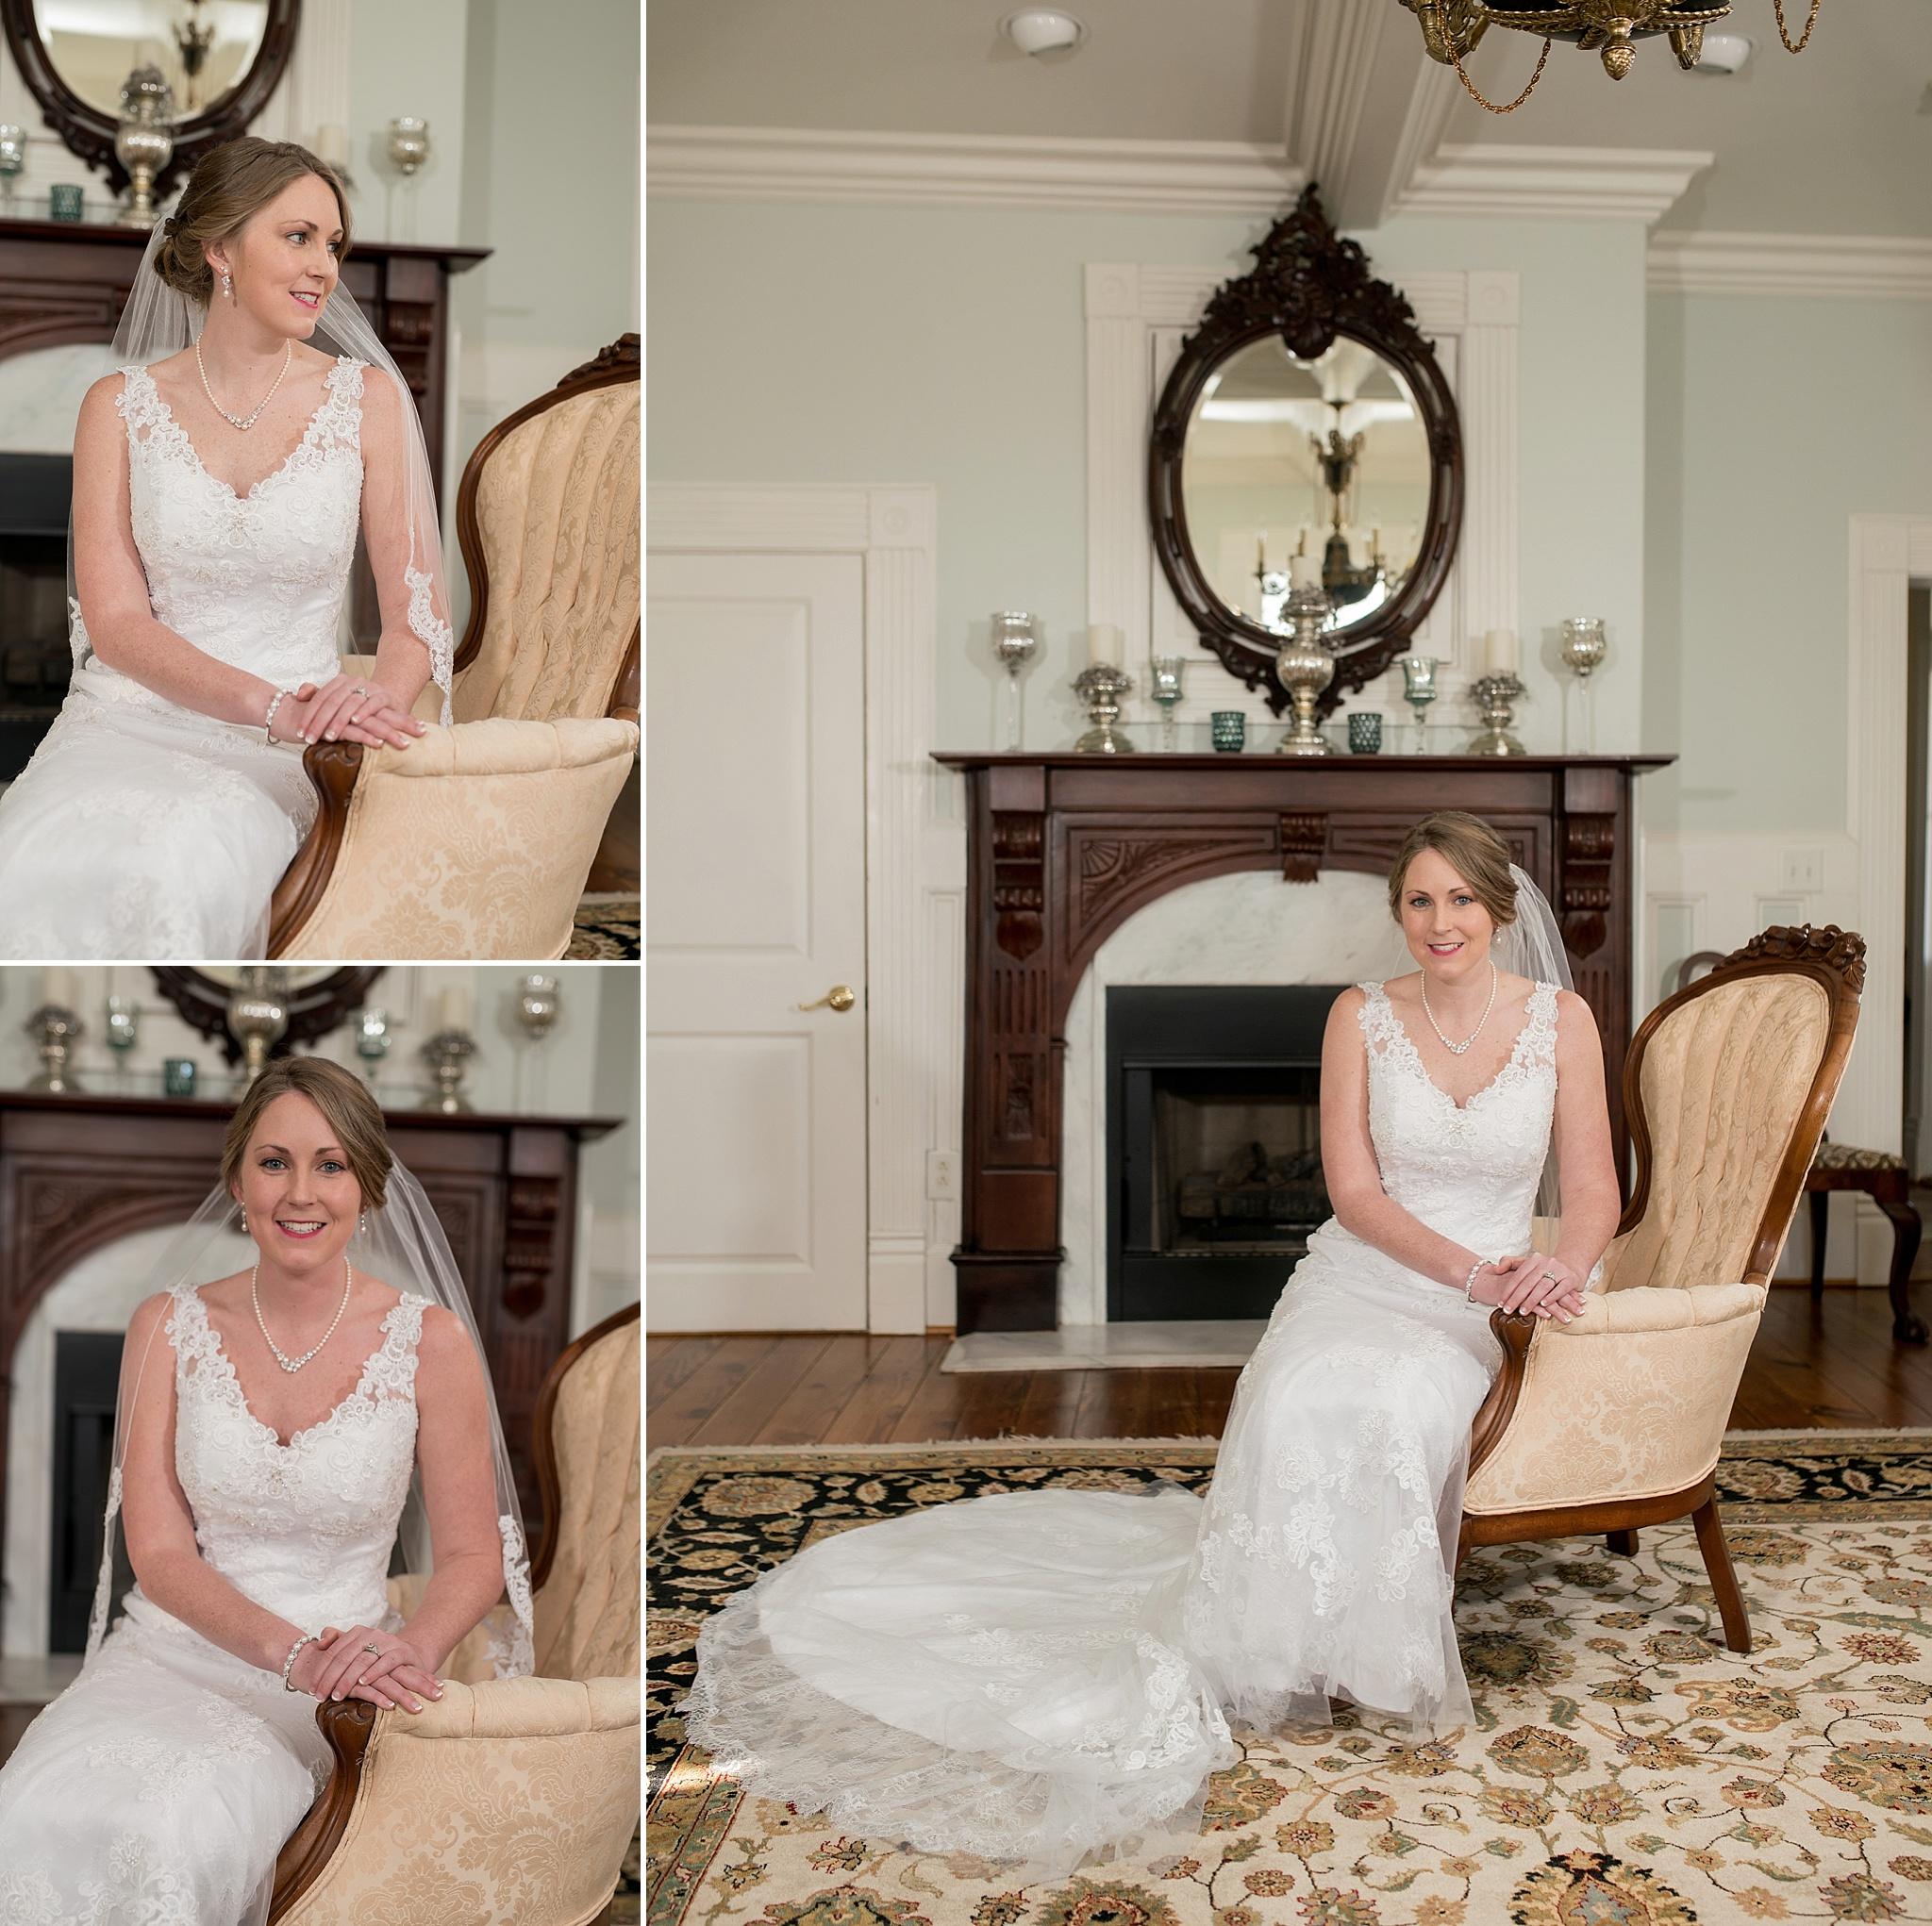 Yankee-Hall-Plantation-Wedding-NC-Photographer-0145.jpg